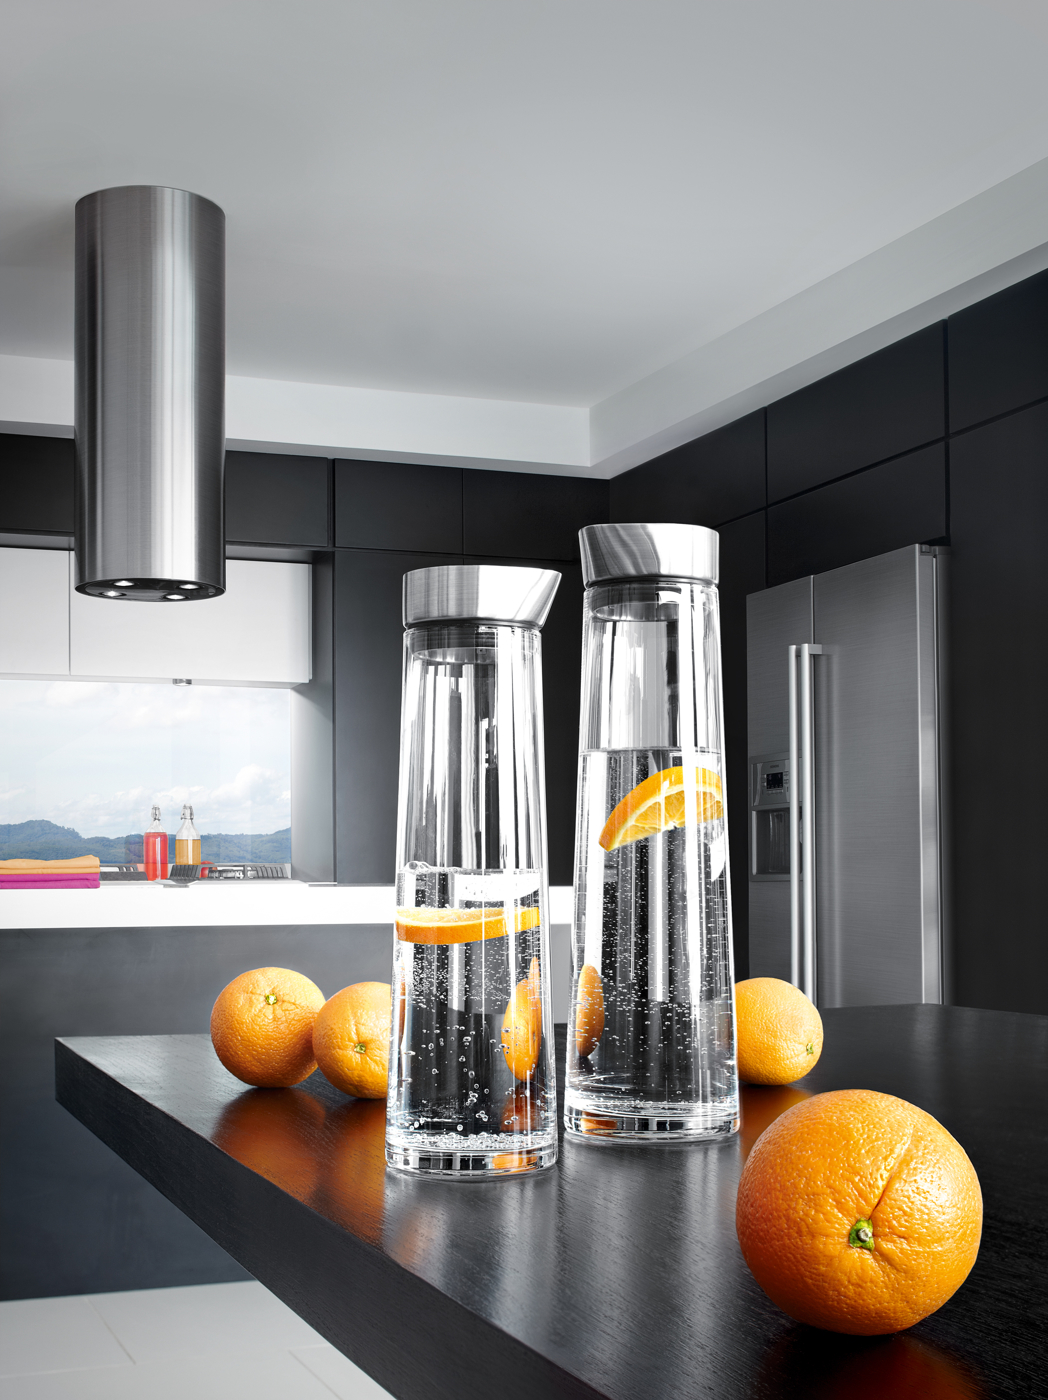 Water-Karaff2-design-brunnsboden-63448